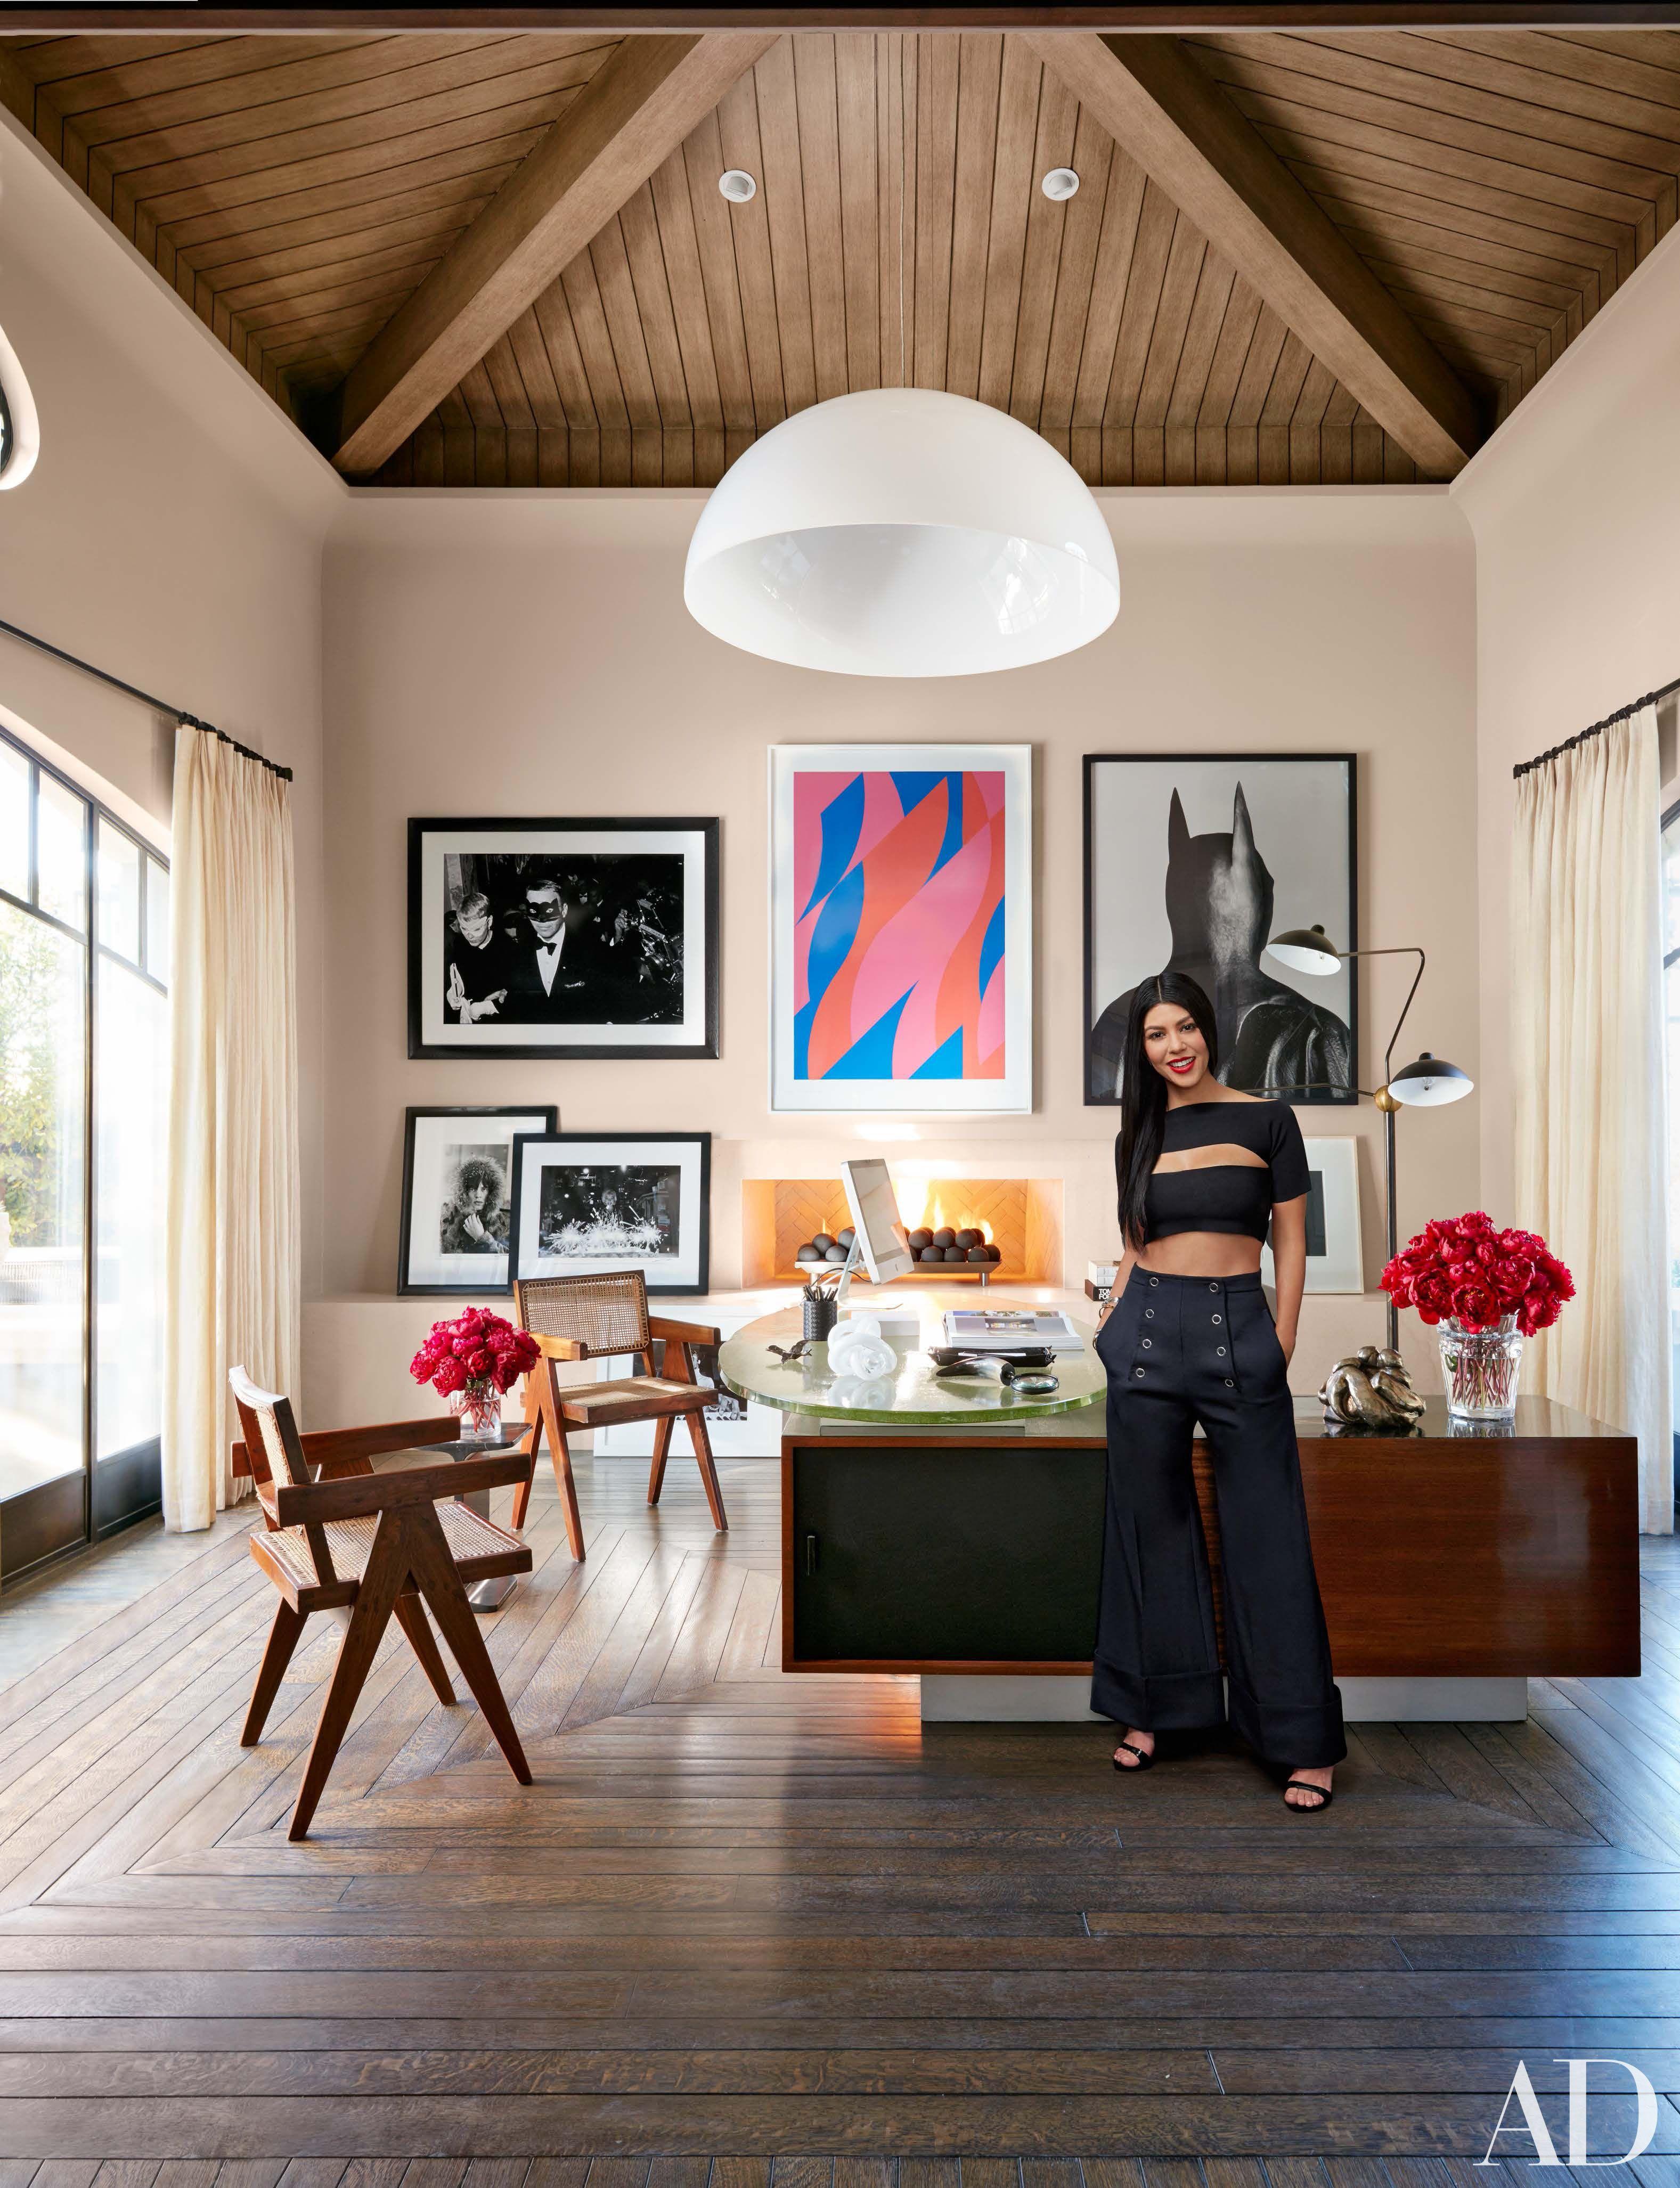 Kourtney Kardashian Shares  Stylish Things From Her Calabasas - Architectural digest modular home designs